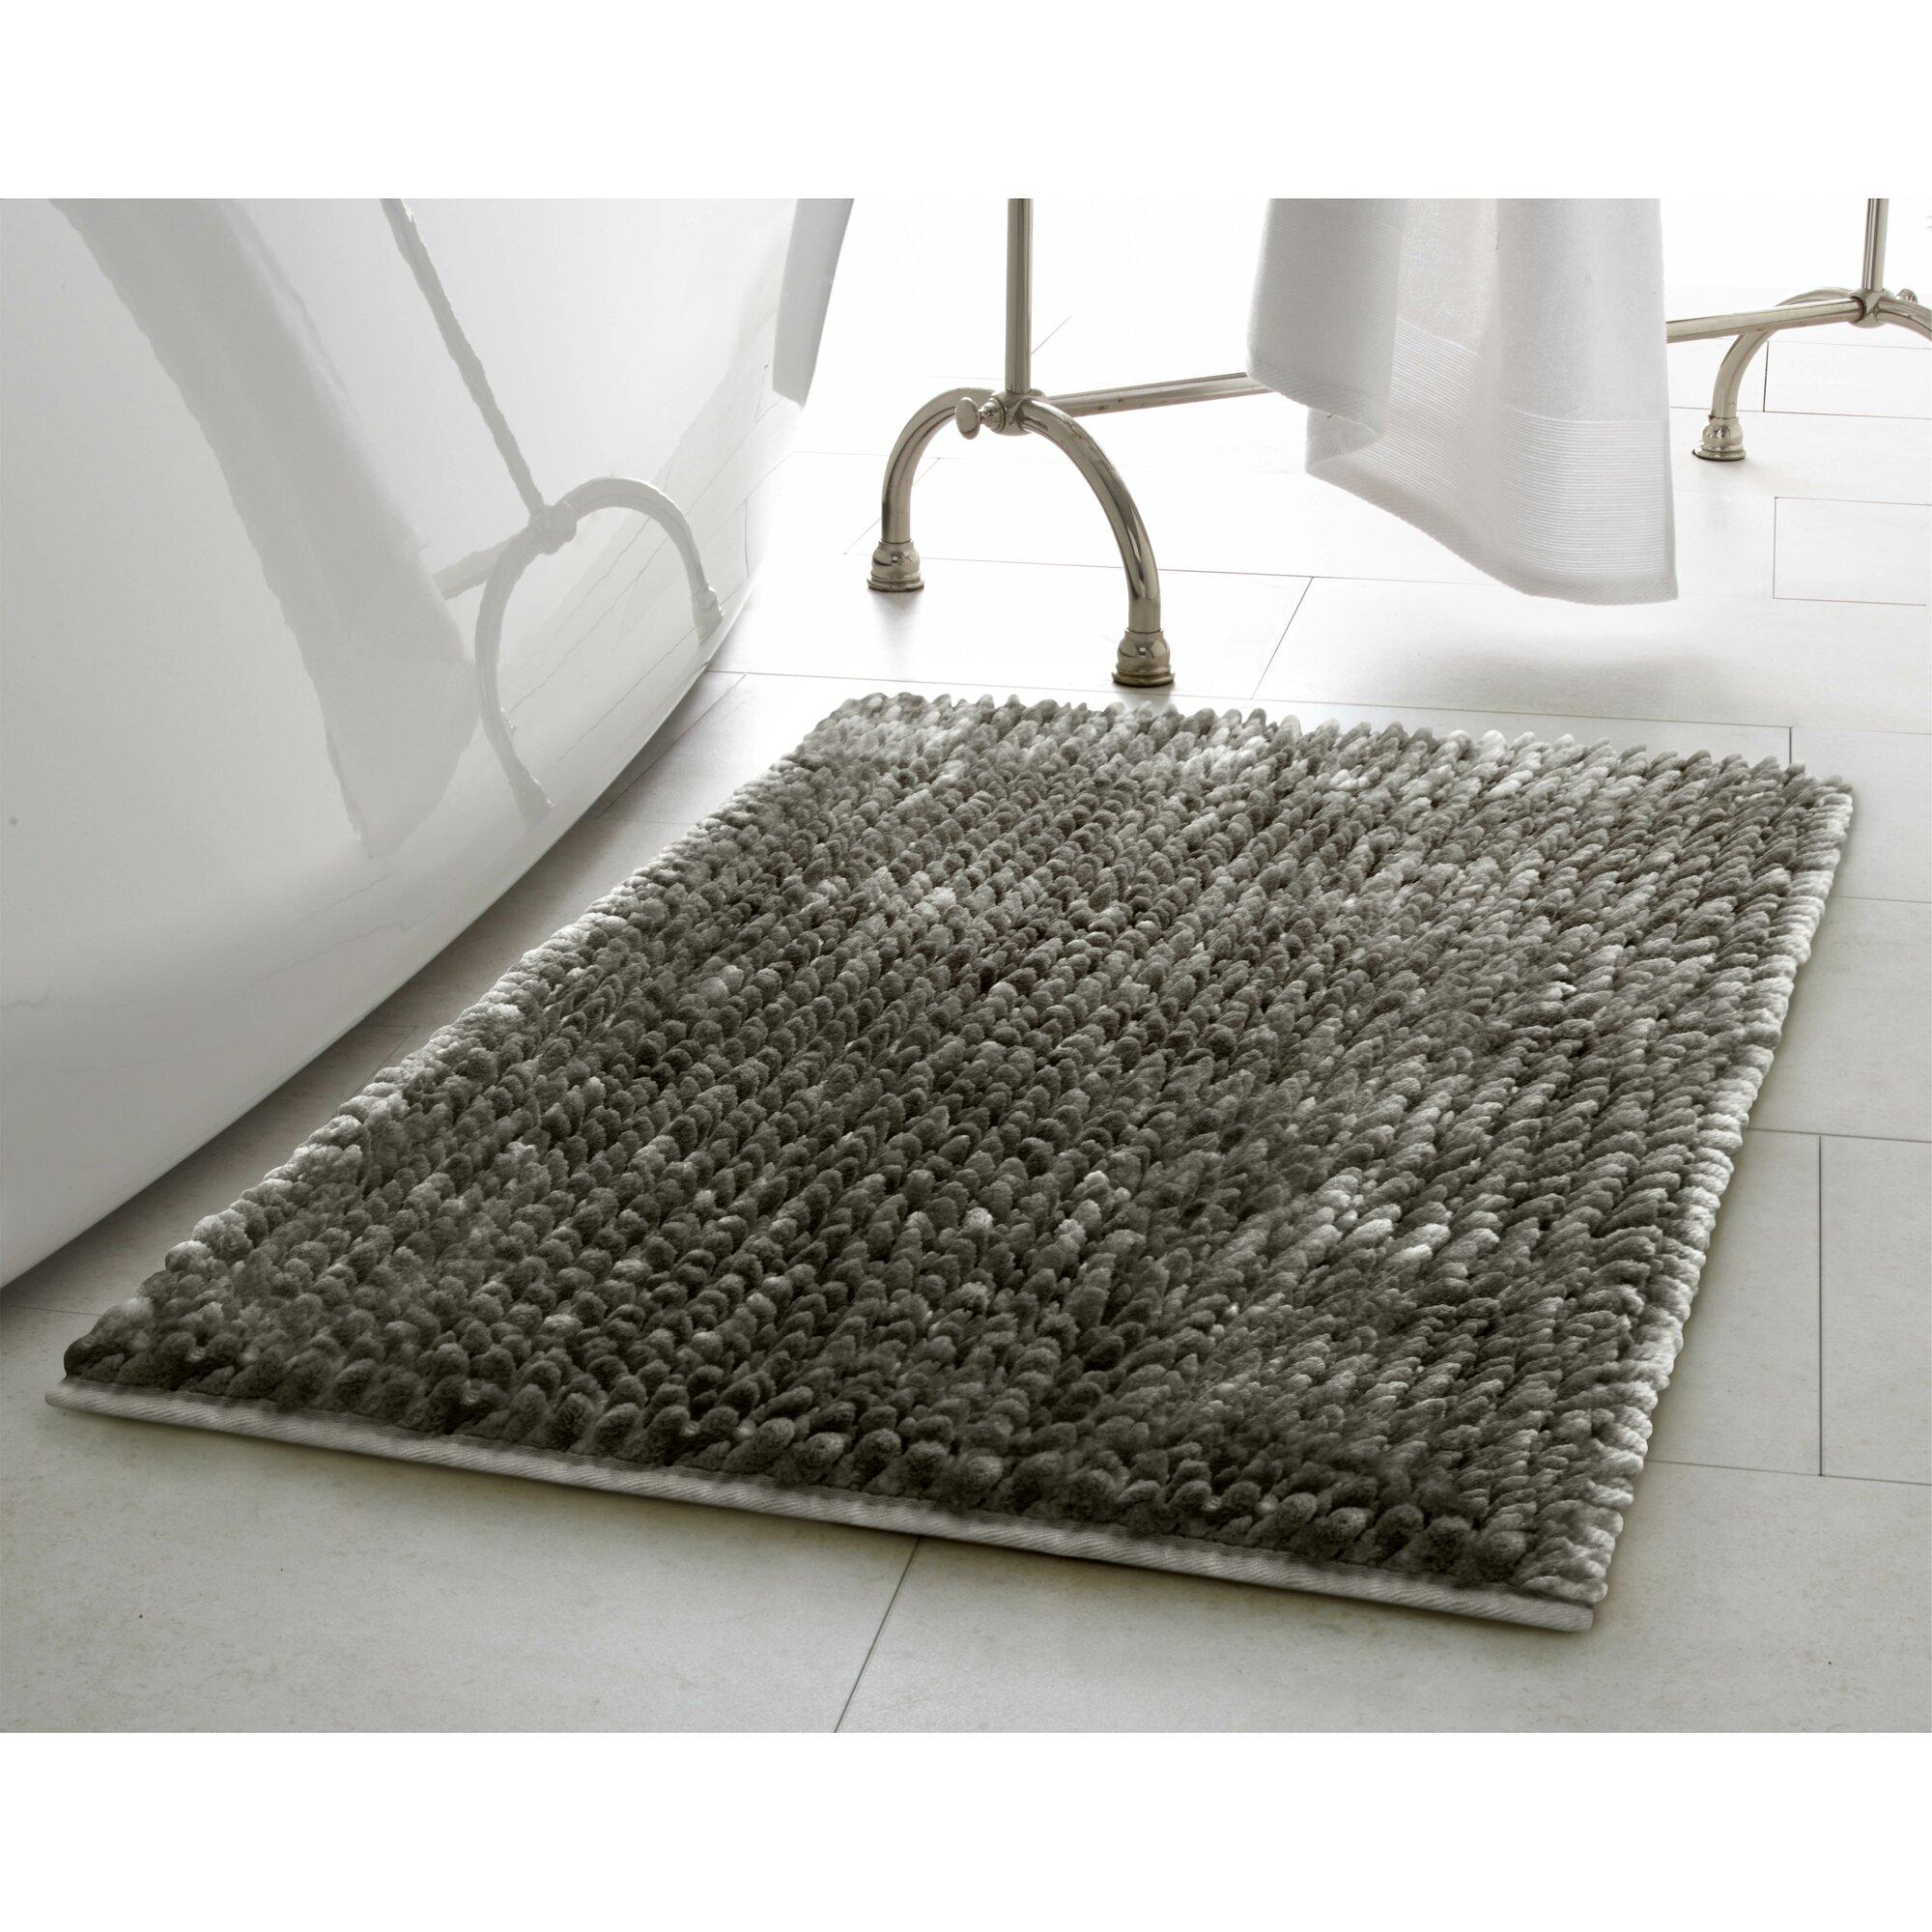 Silver Bathroom Rugs